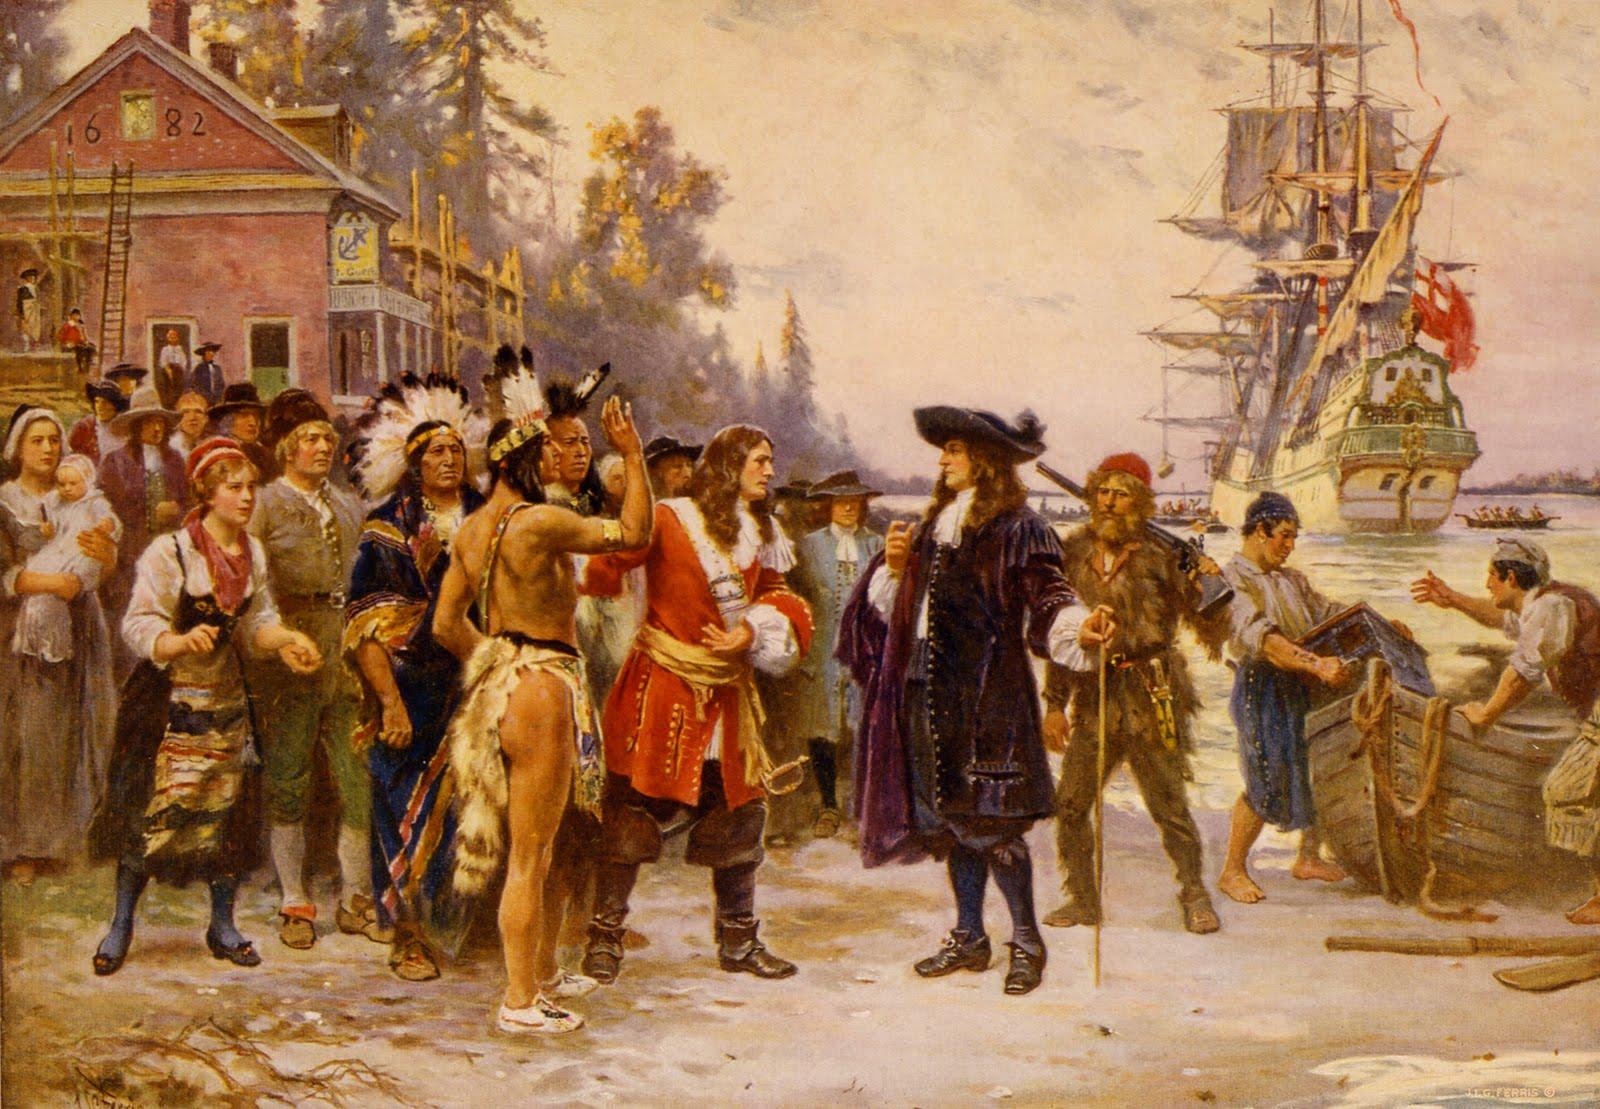 Falmanac: William Penn and His Holy Experiment